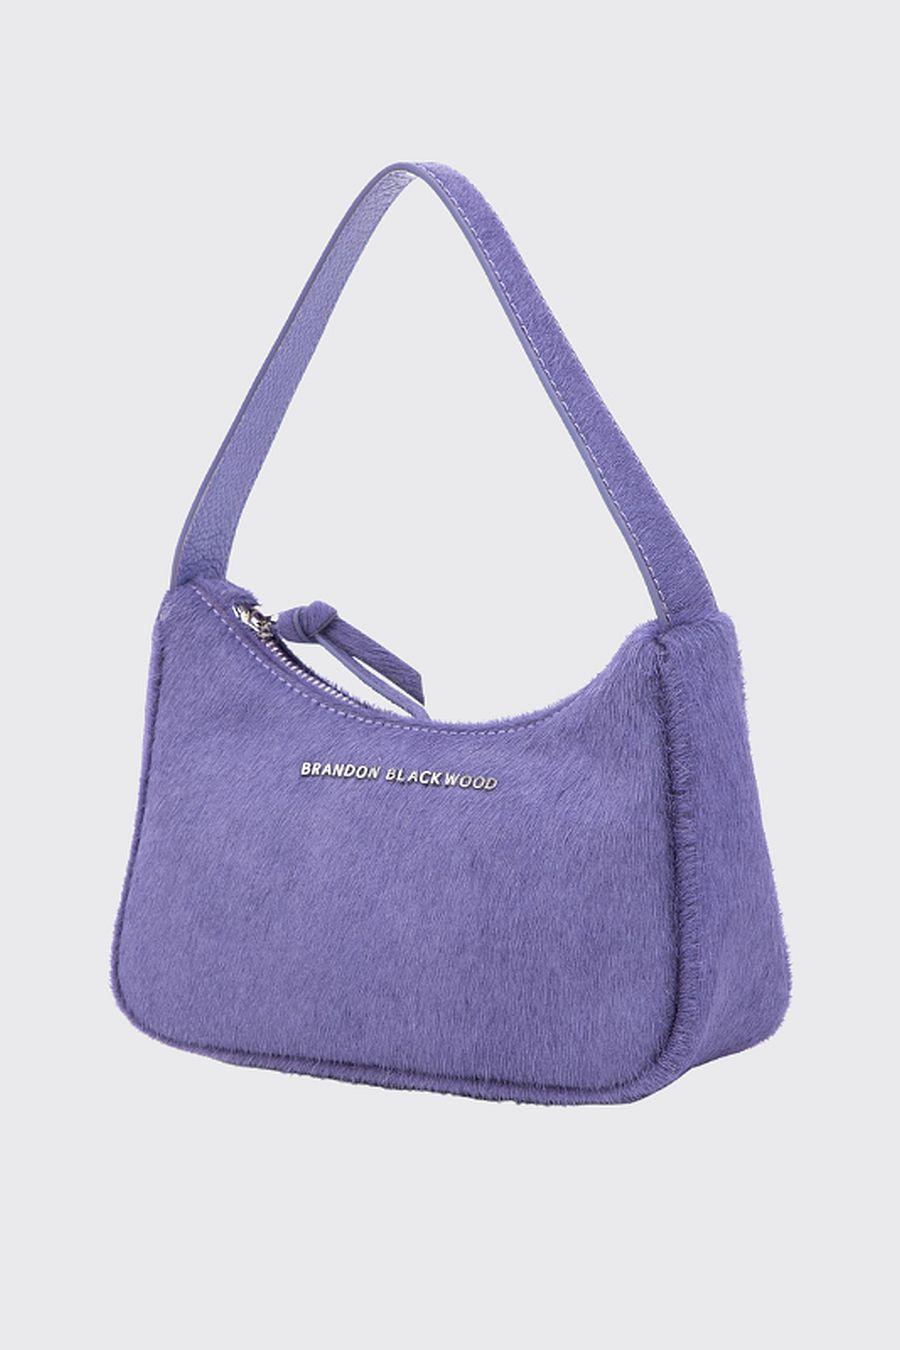 Brandon Blackwood SYL Bag - Purple Ponyhair